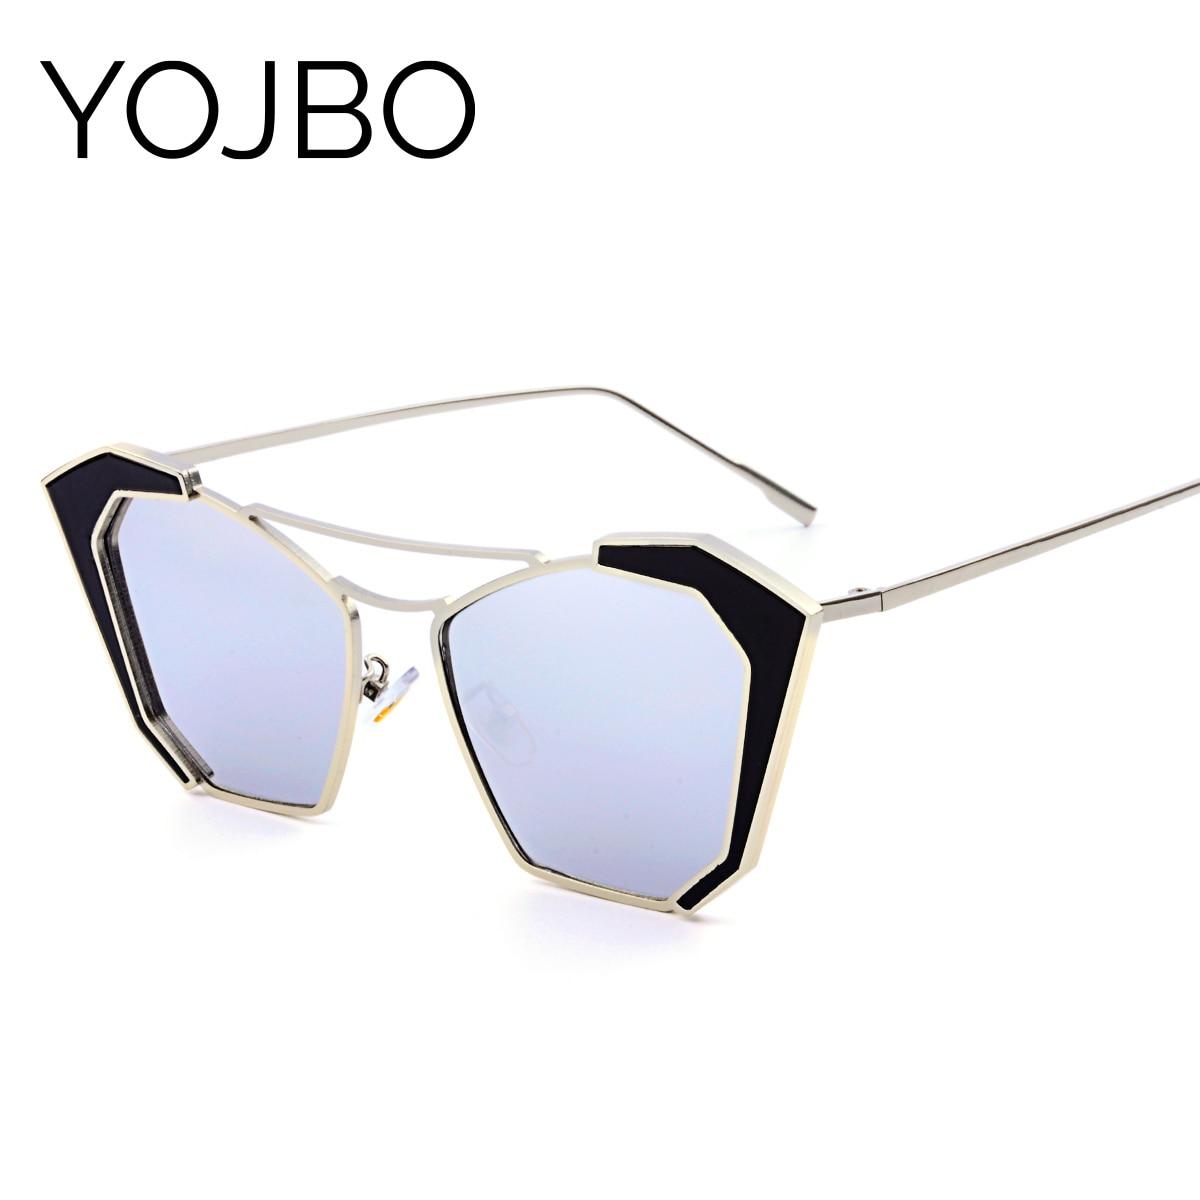 ba7dfc3323 YOJBO Real Polarized Women Sunglasses 2018 Fashion Retro Mirror Sun Glasses  Alloy Vintage Brand Designer Glasses-in Sunglasses from Women s Clothing ...